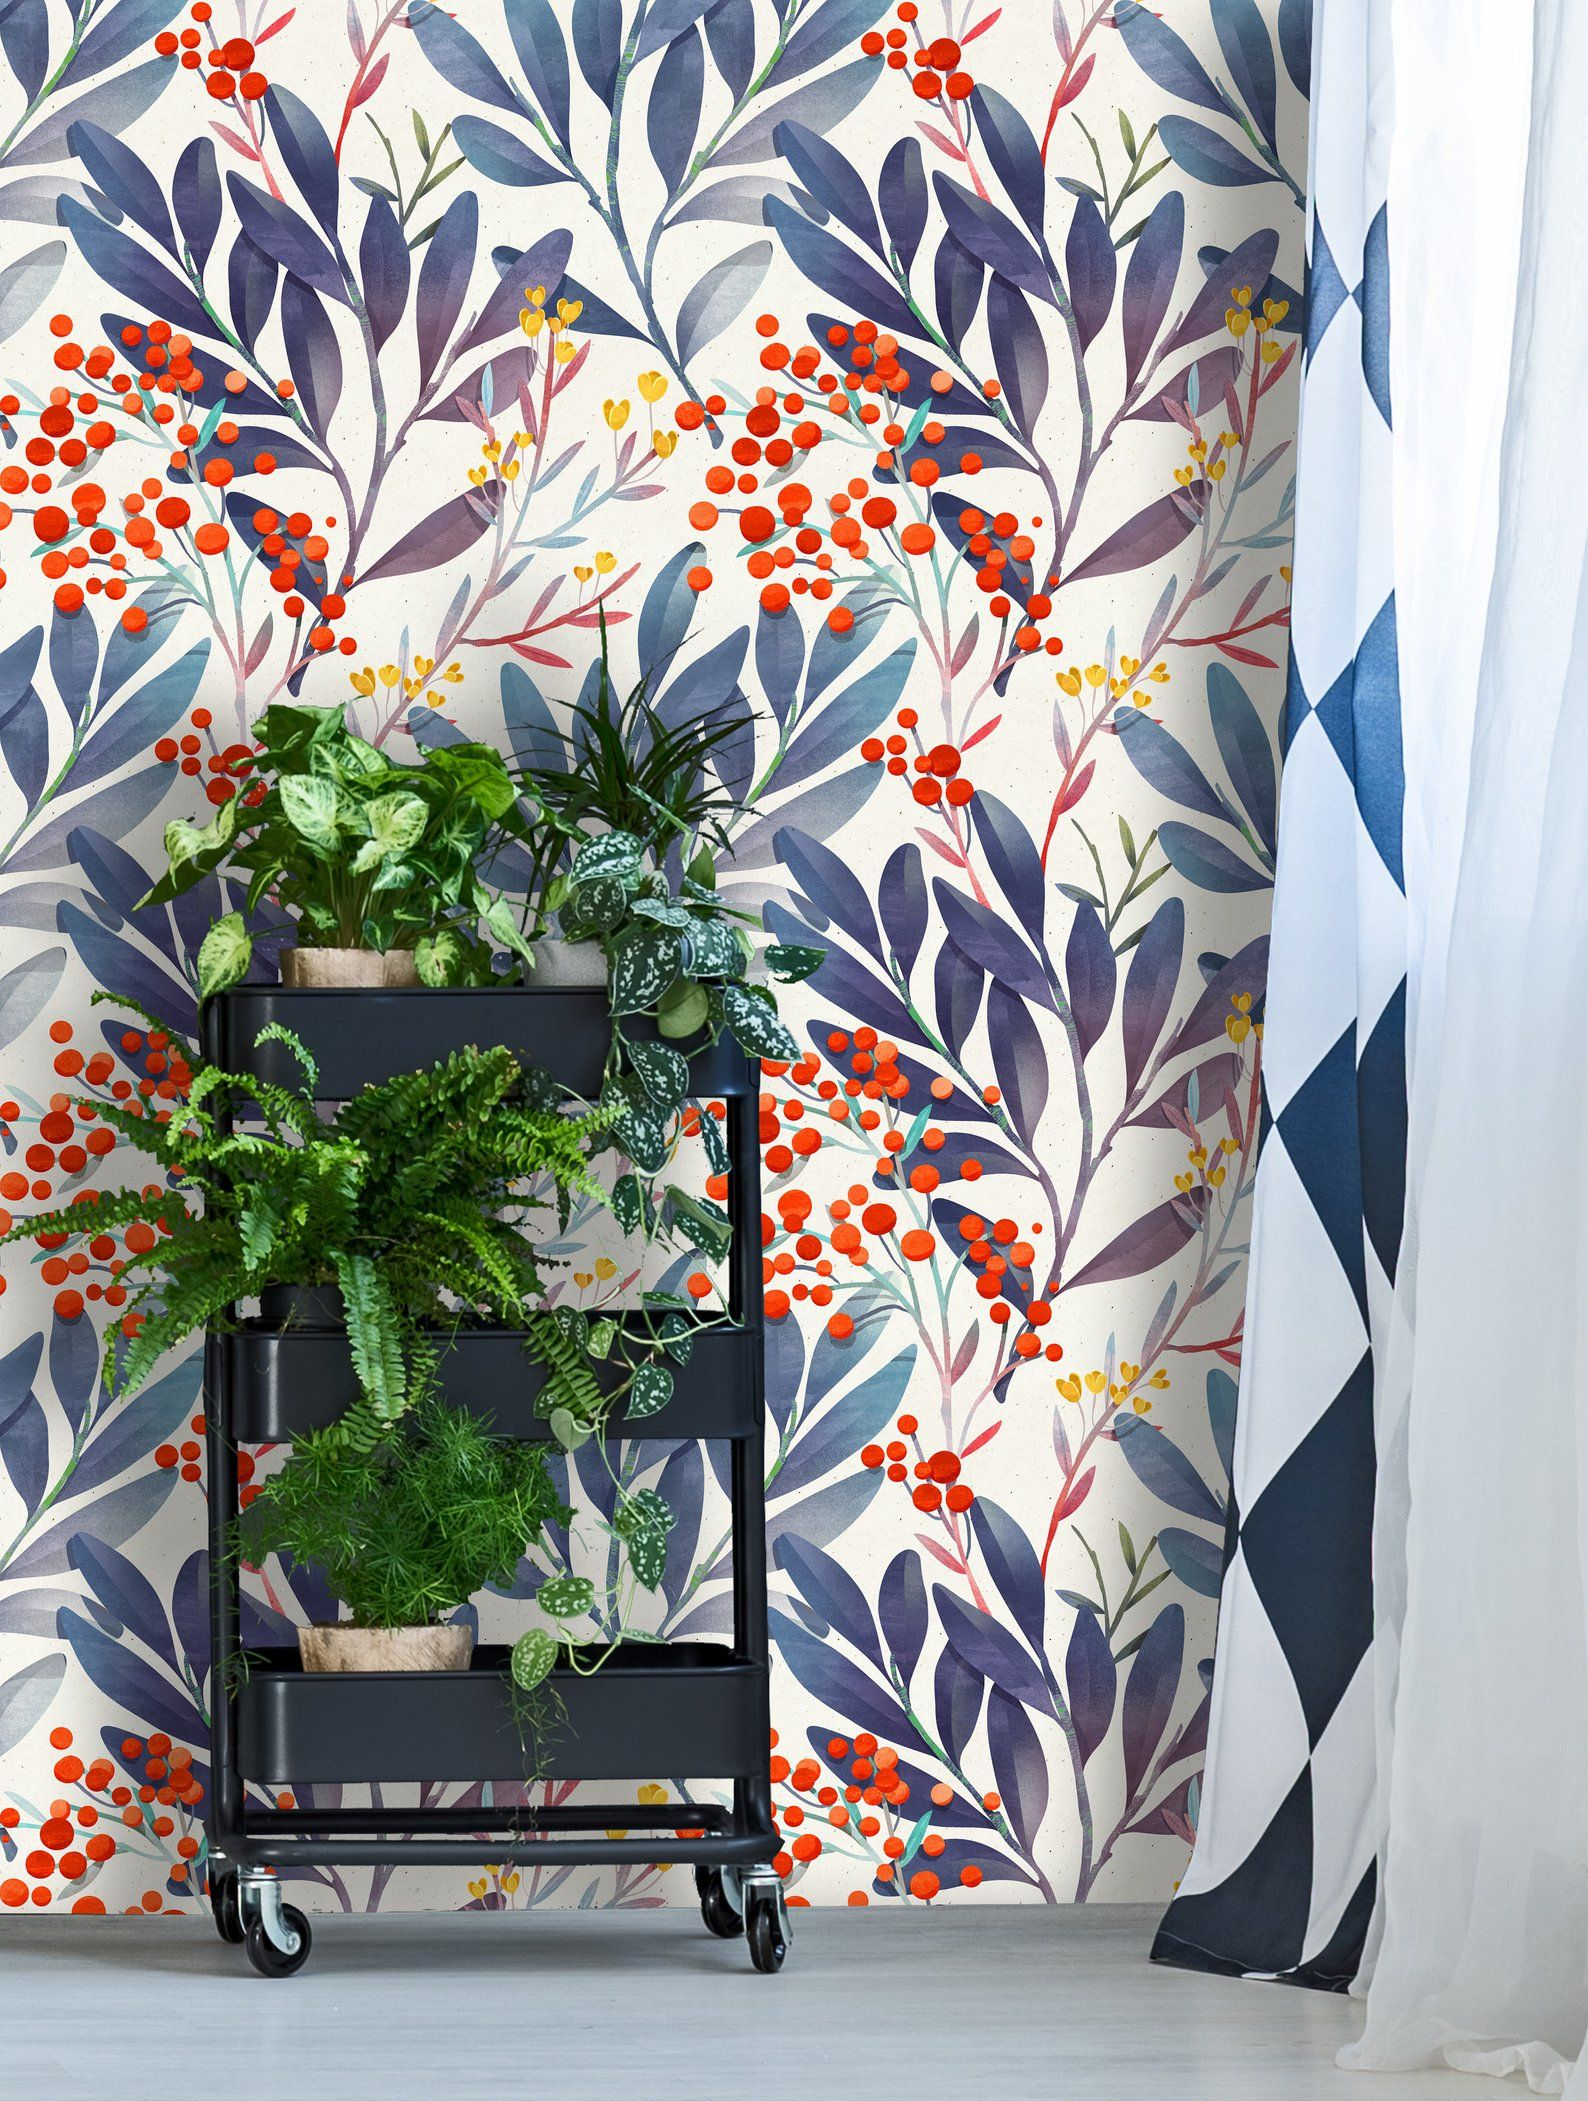 Removable Wallpaper Self Adhesive Wallpaper Wild Berries